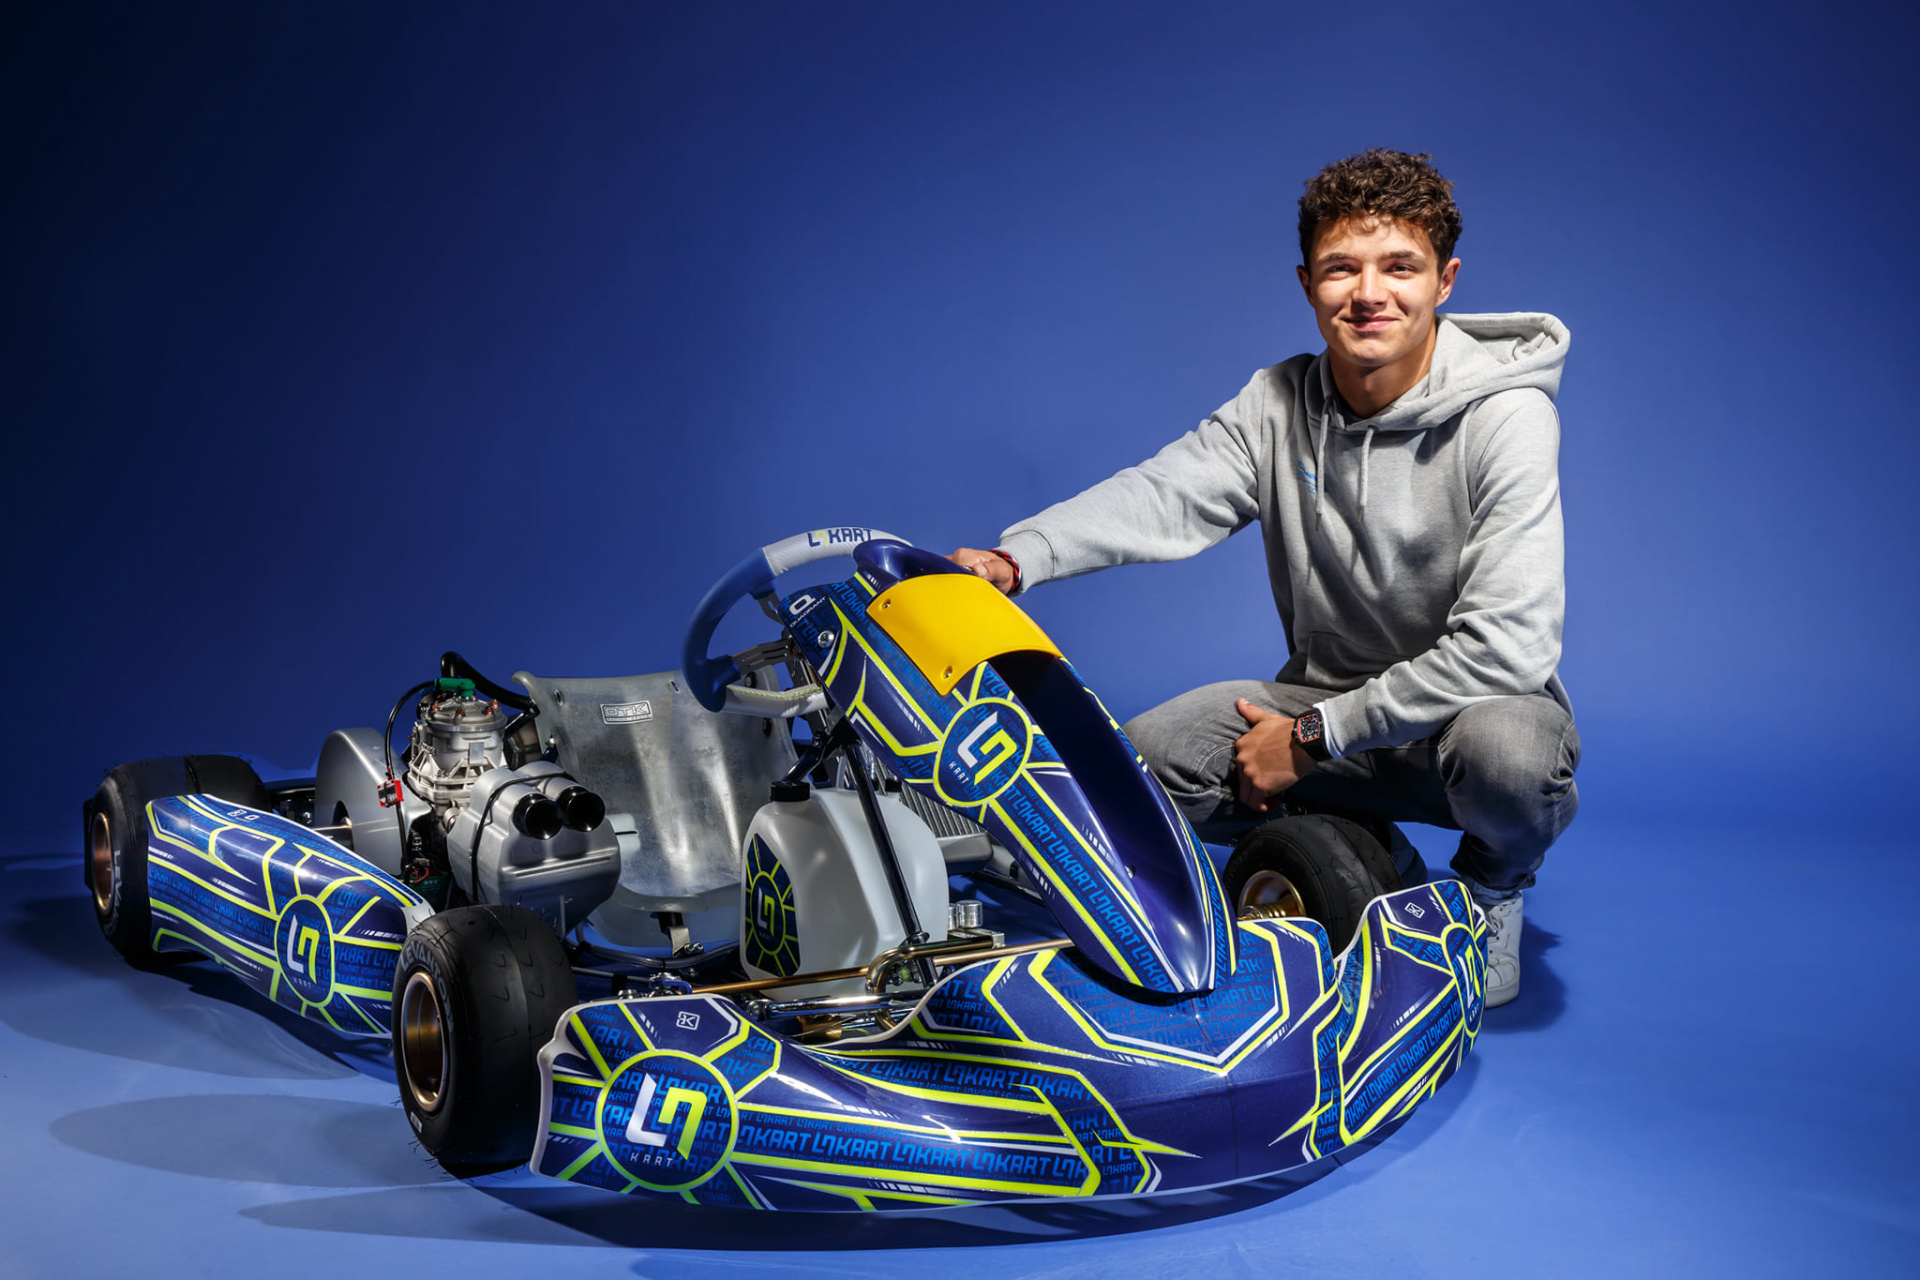 LN Four Is Born, Lando Norris' Kart Made In OTK Kart Group